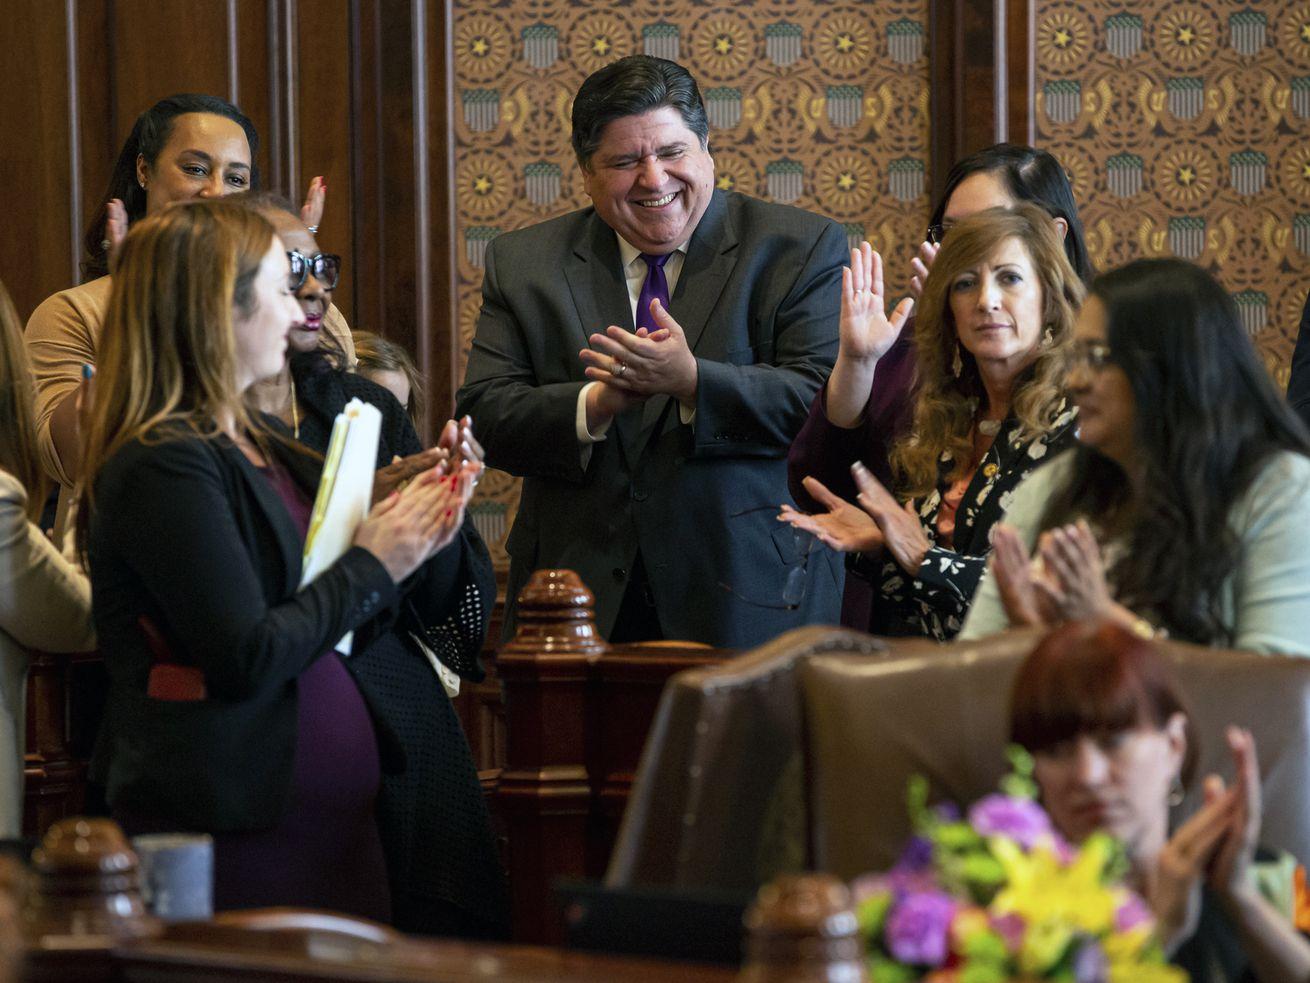 Gov. J.B. Pritzker cheers as Illinois Senate President John Cullerton, D-Chicago, gives his final remarks on the floor of the Illinois Senate on Sunday.